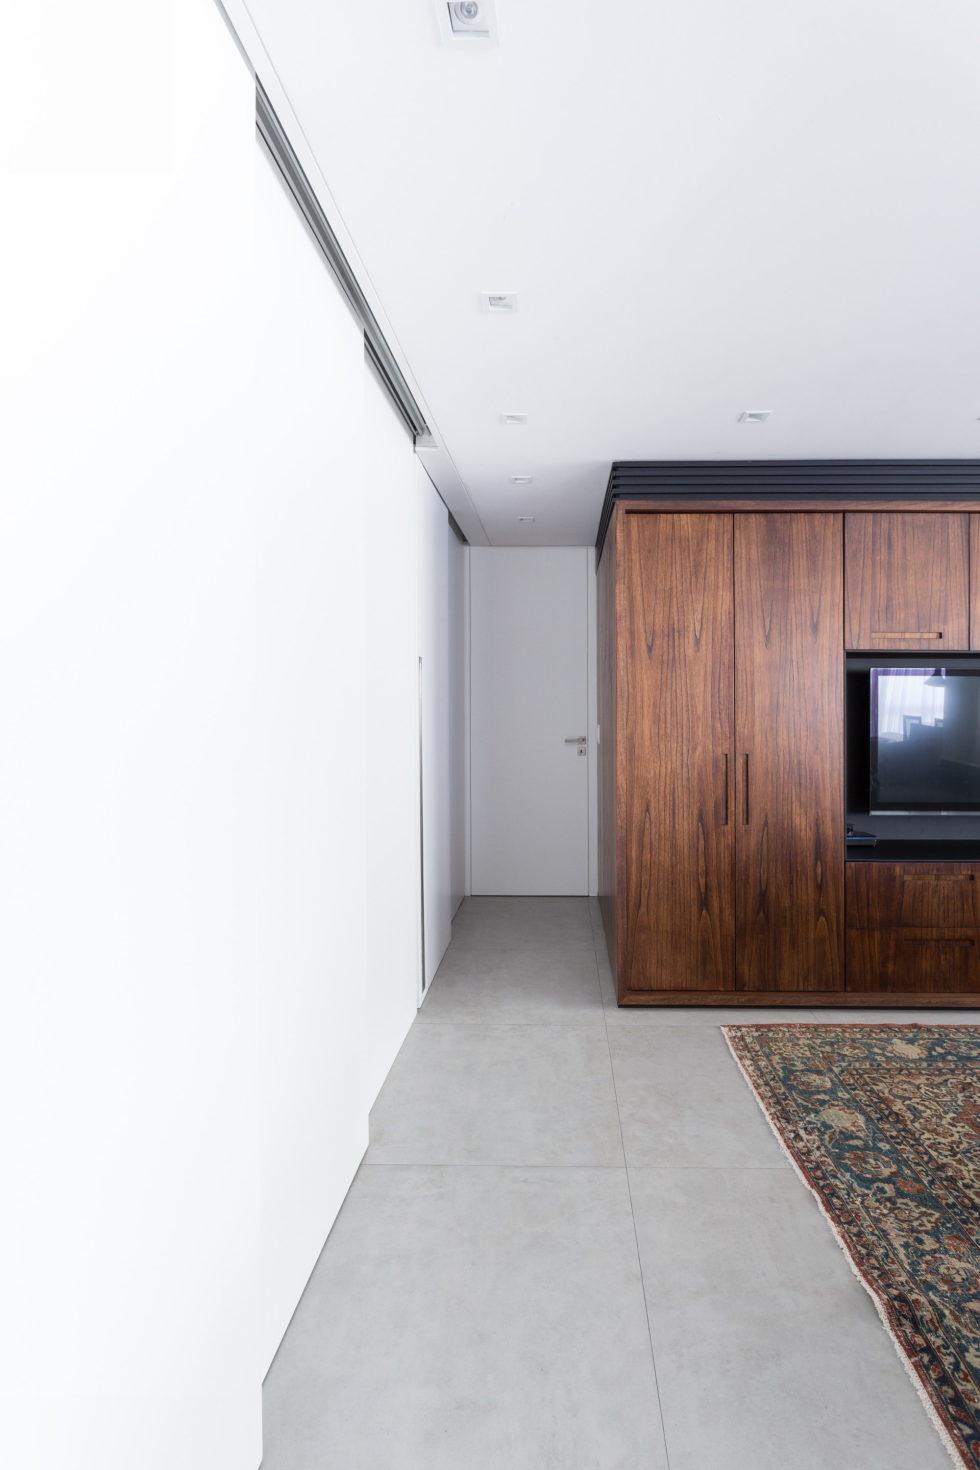 The PLAZA Apartments The Ambidestro Bureau Project 13